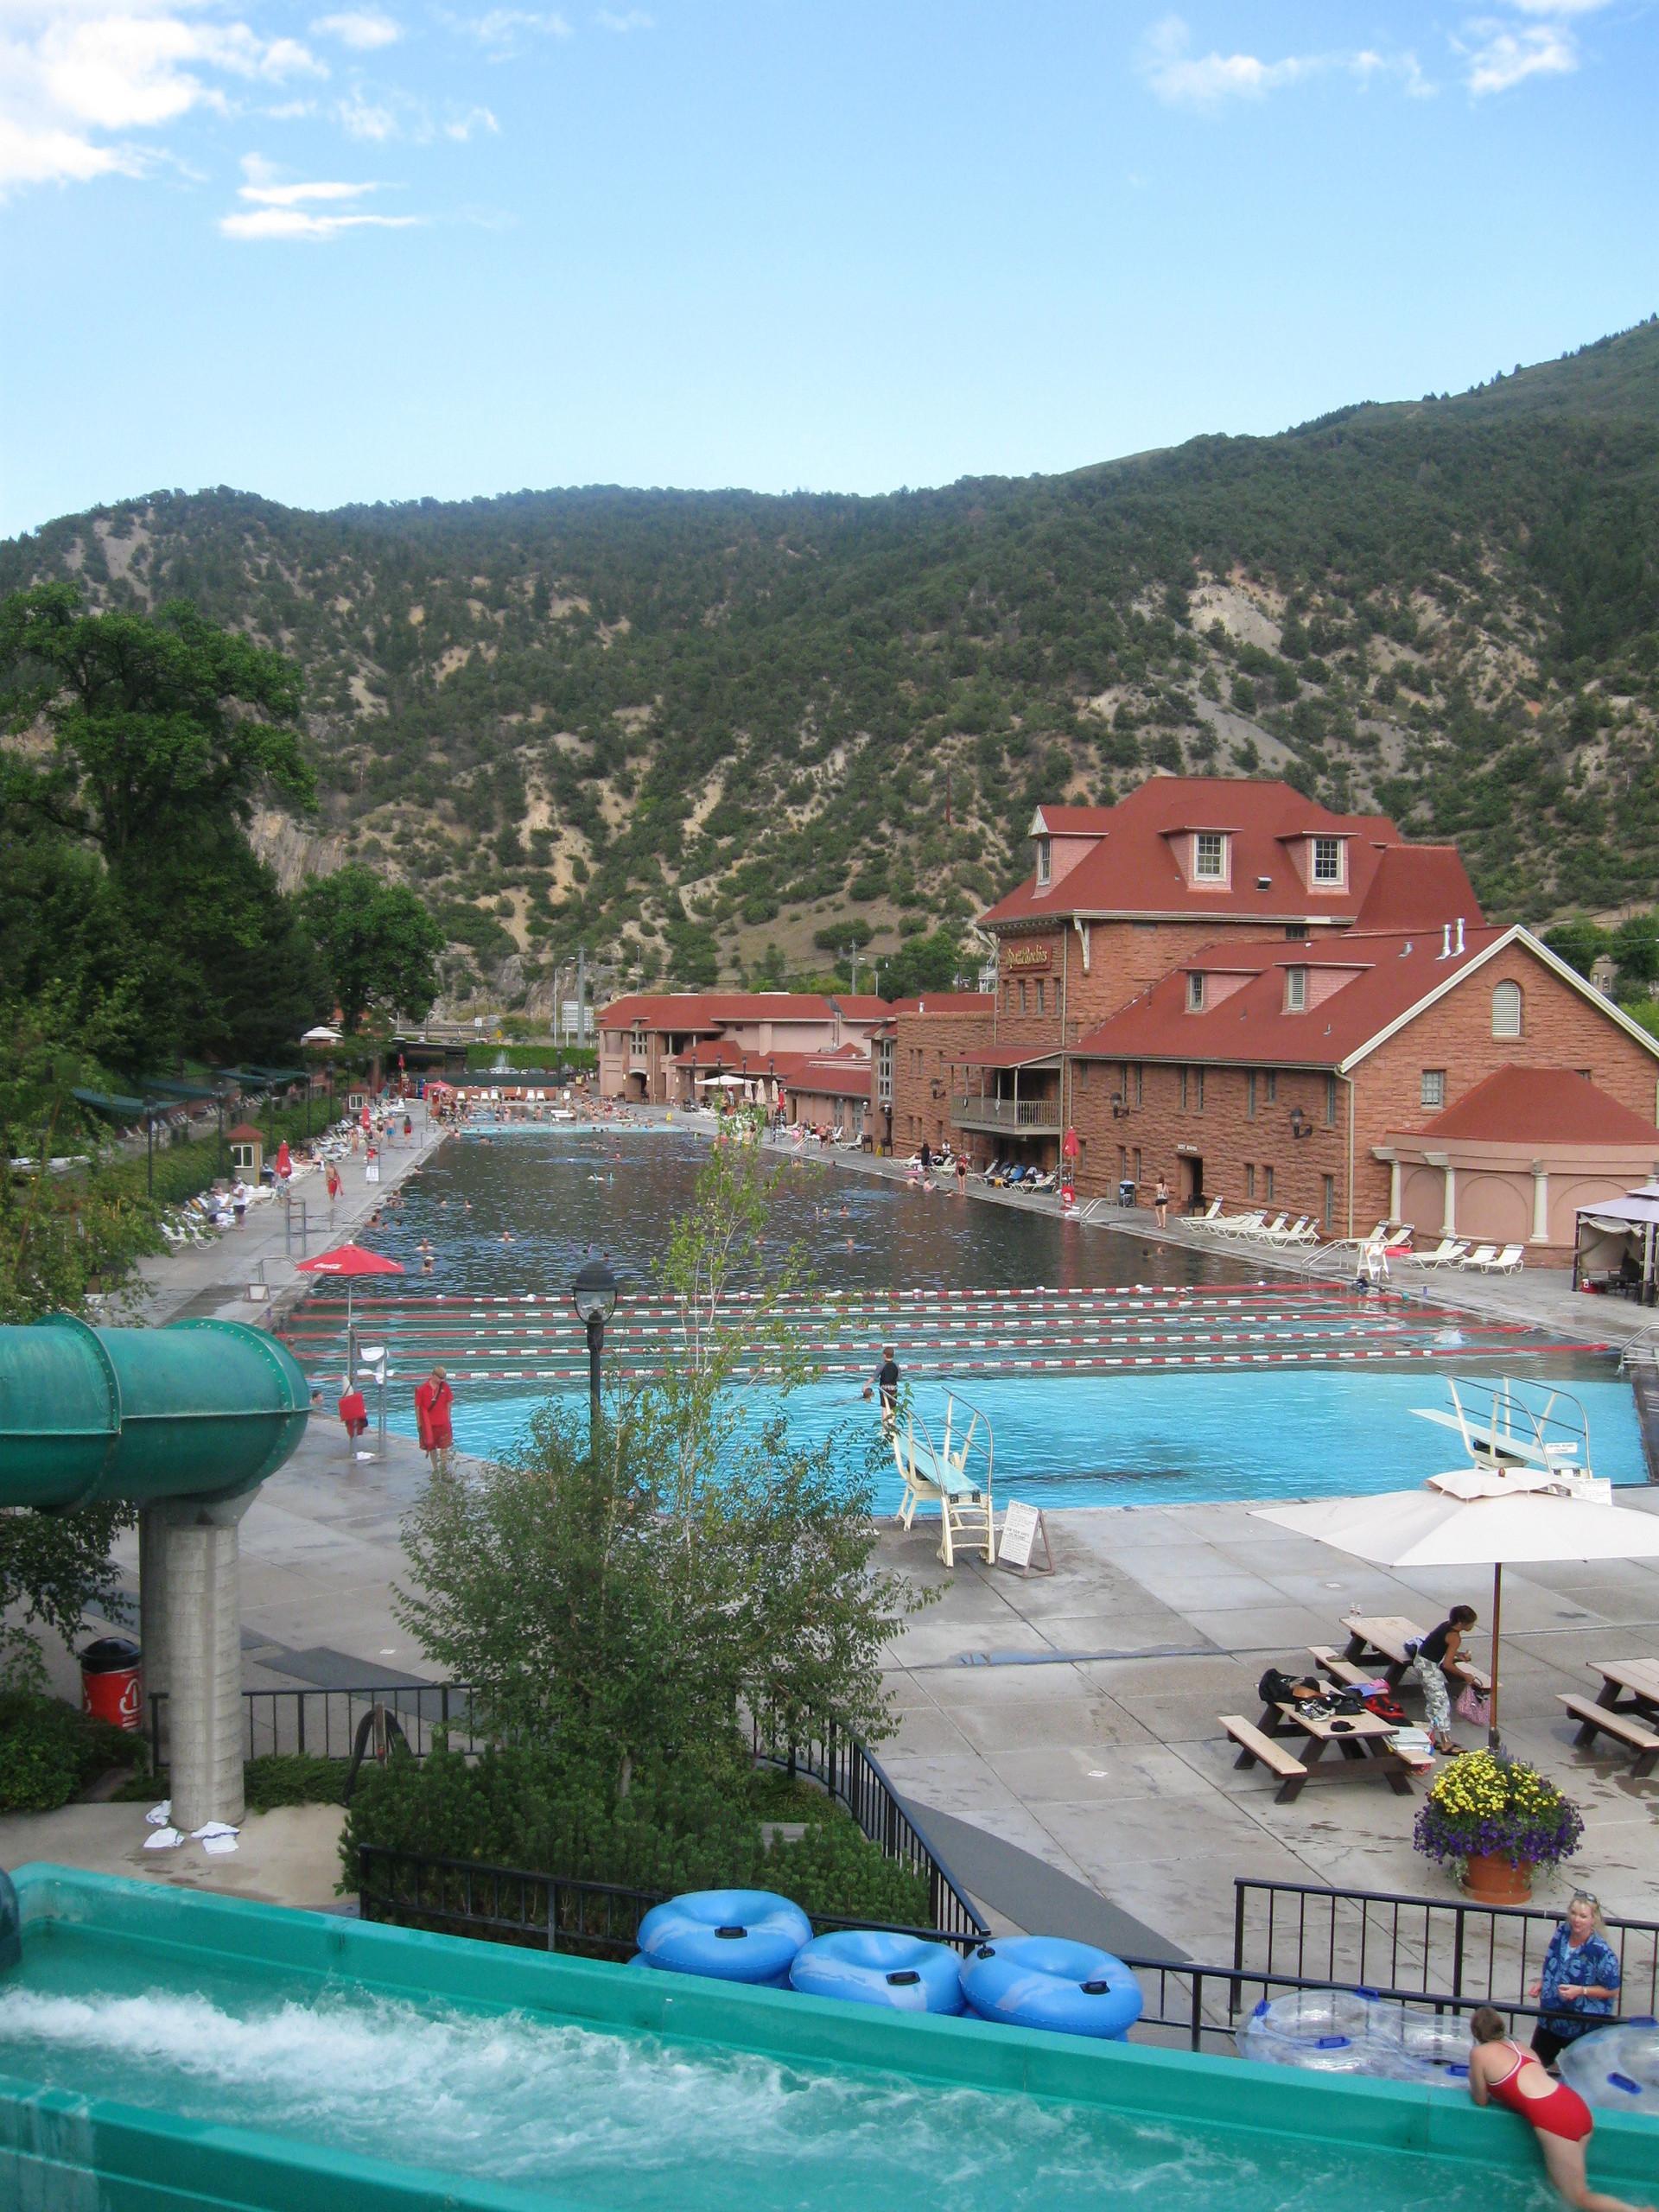 Glenwood Springs,Colorado